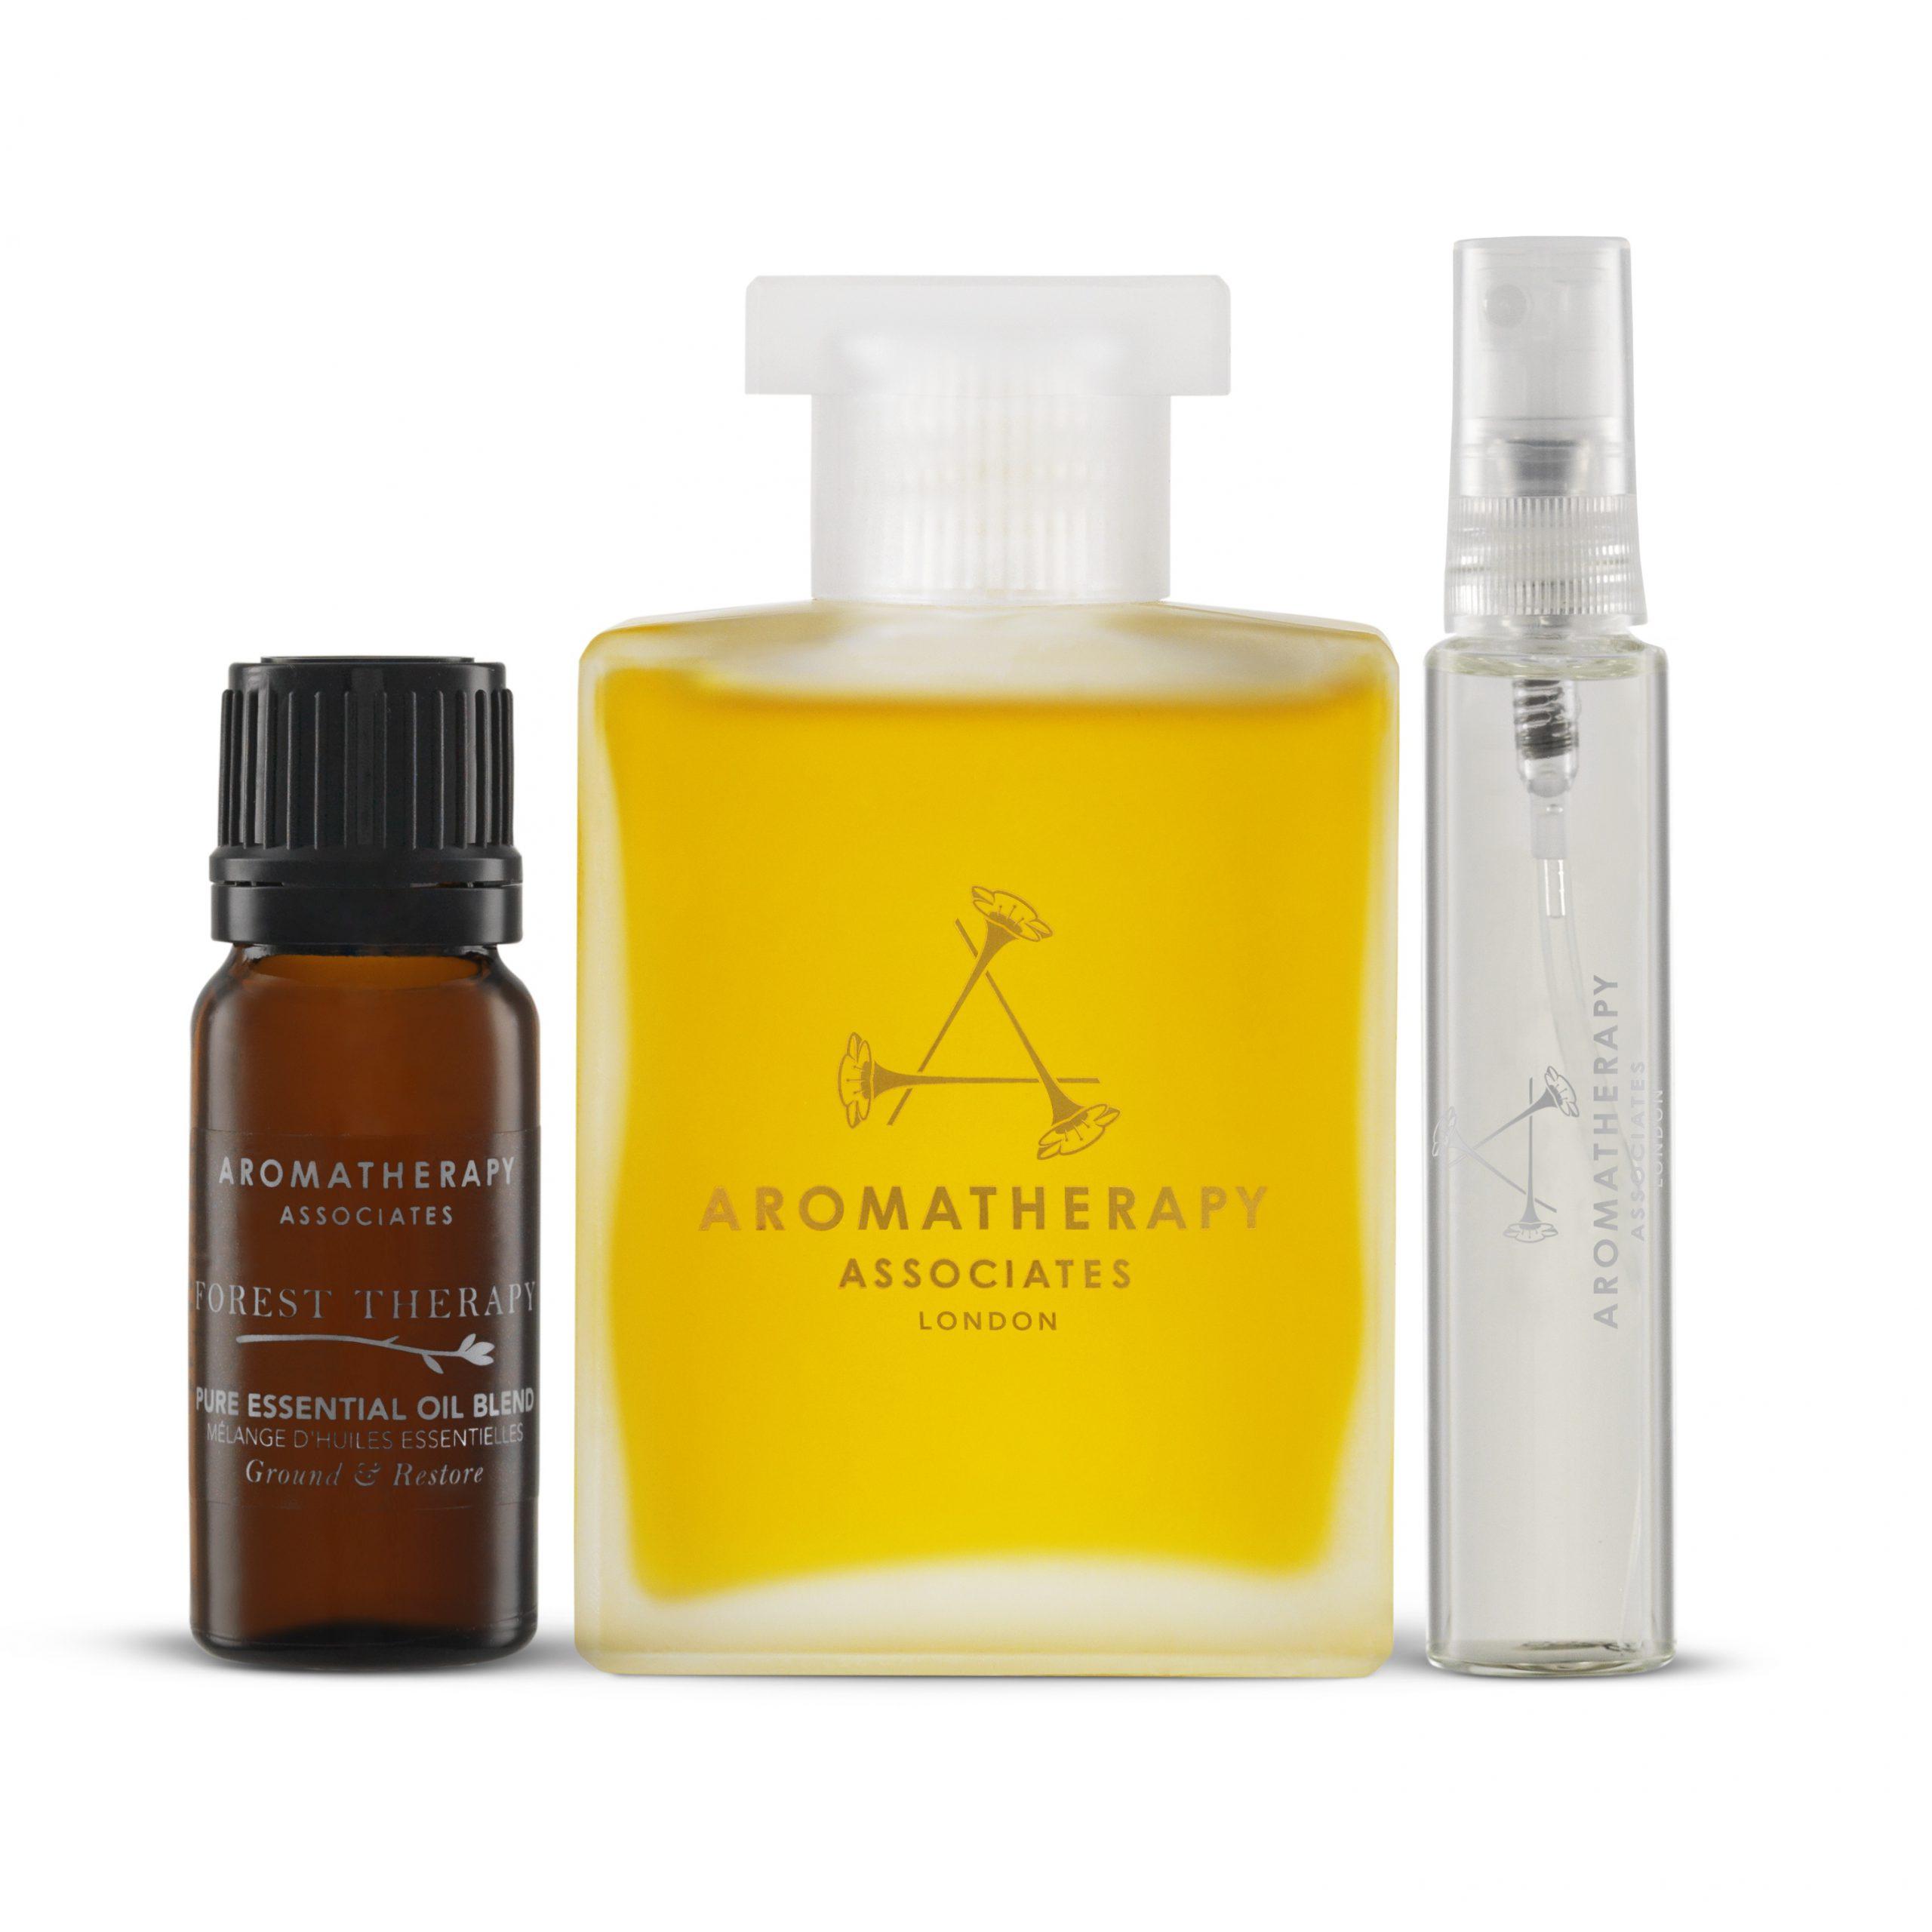 win aromatherapy associates